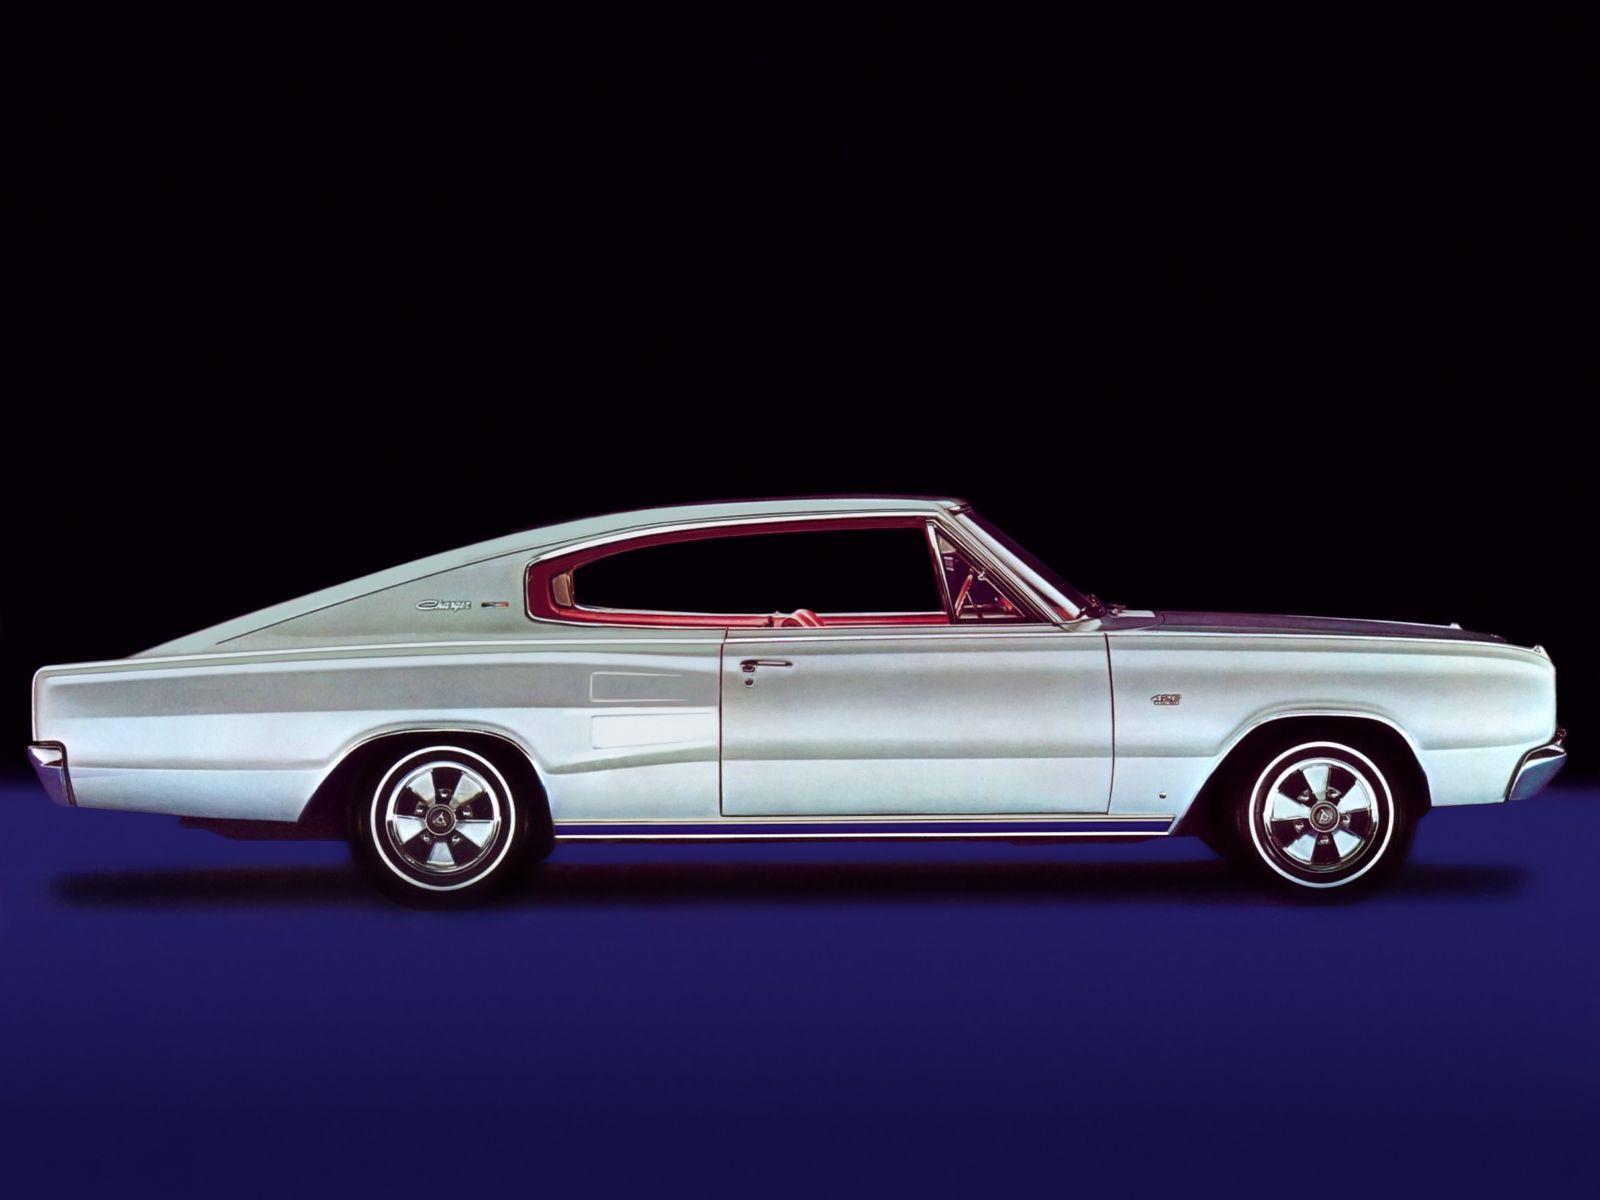 1967 Dodge Charger Hemi